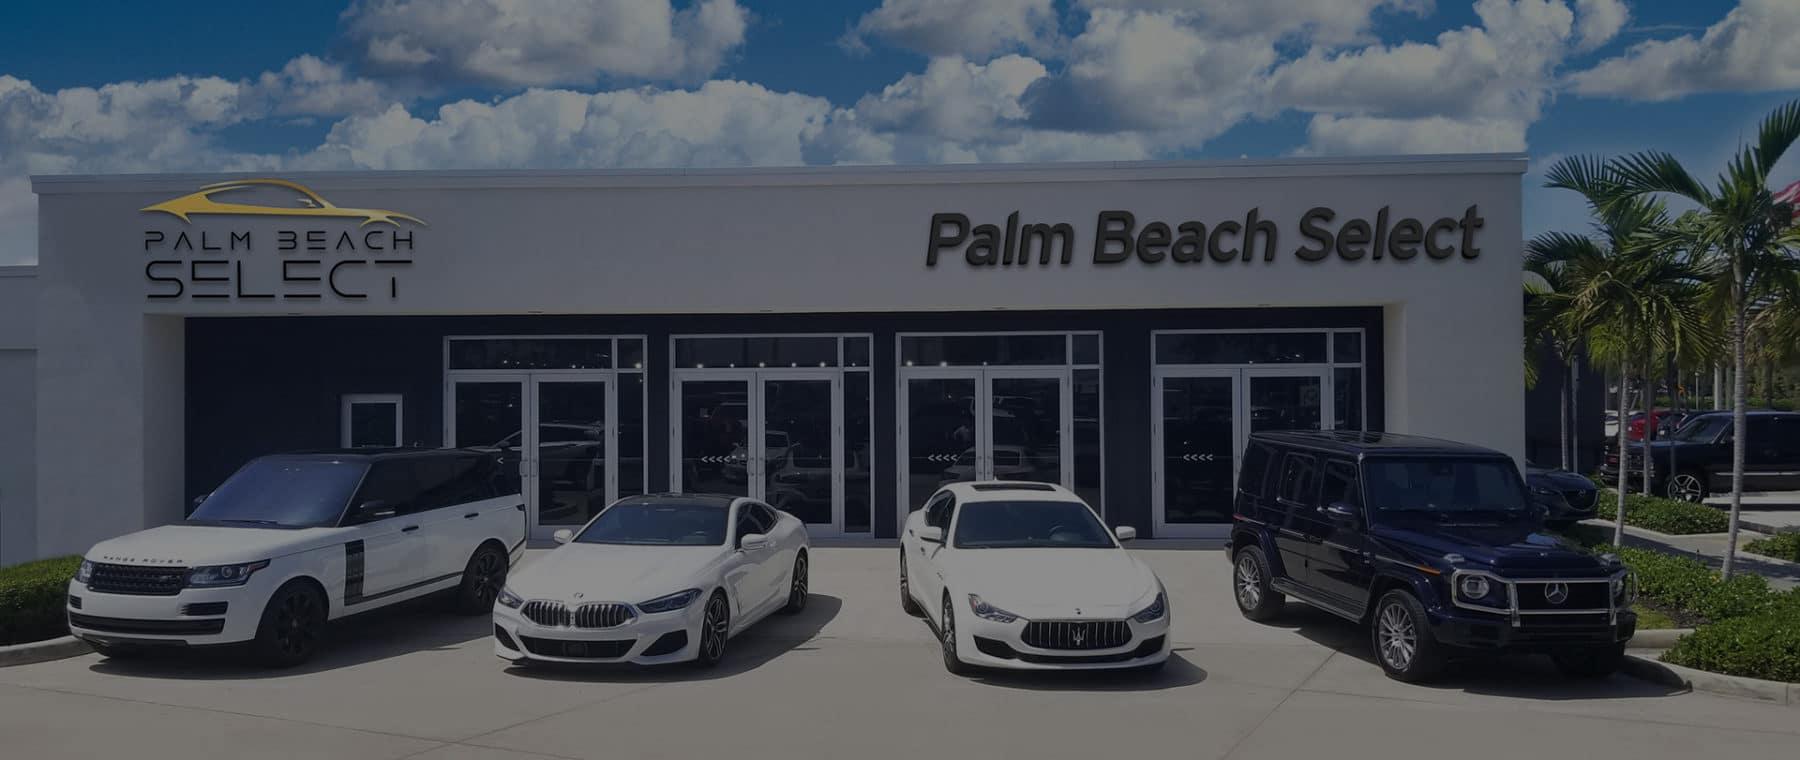 Mazda-Palm-Beach-Select-B